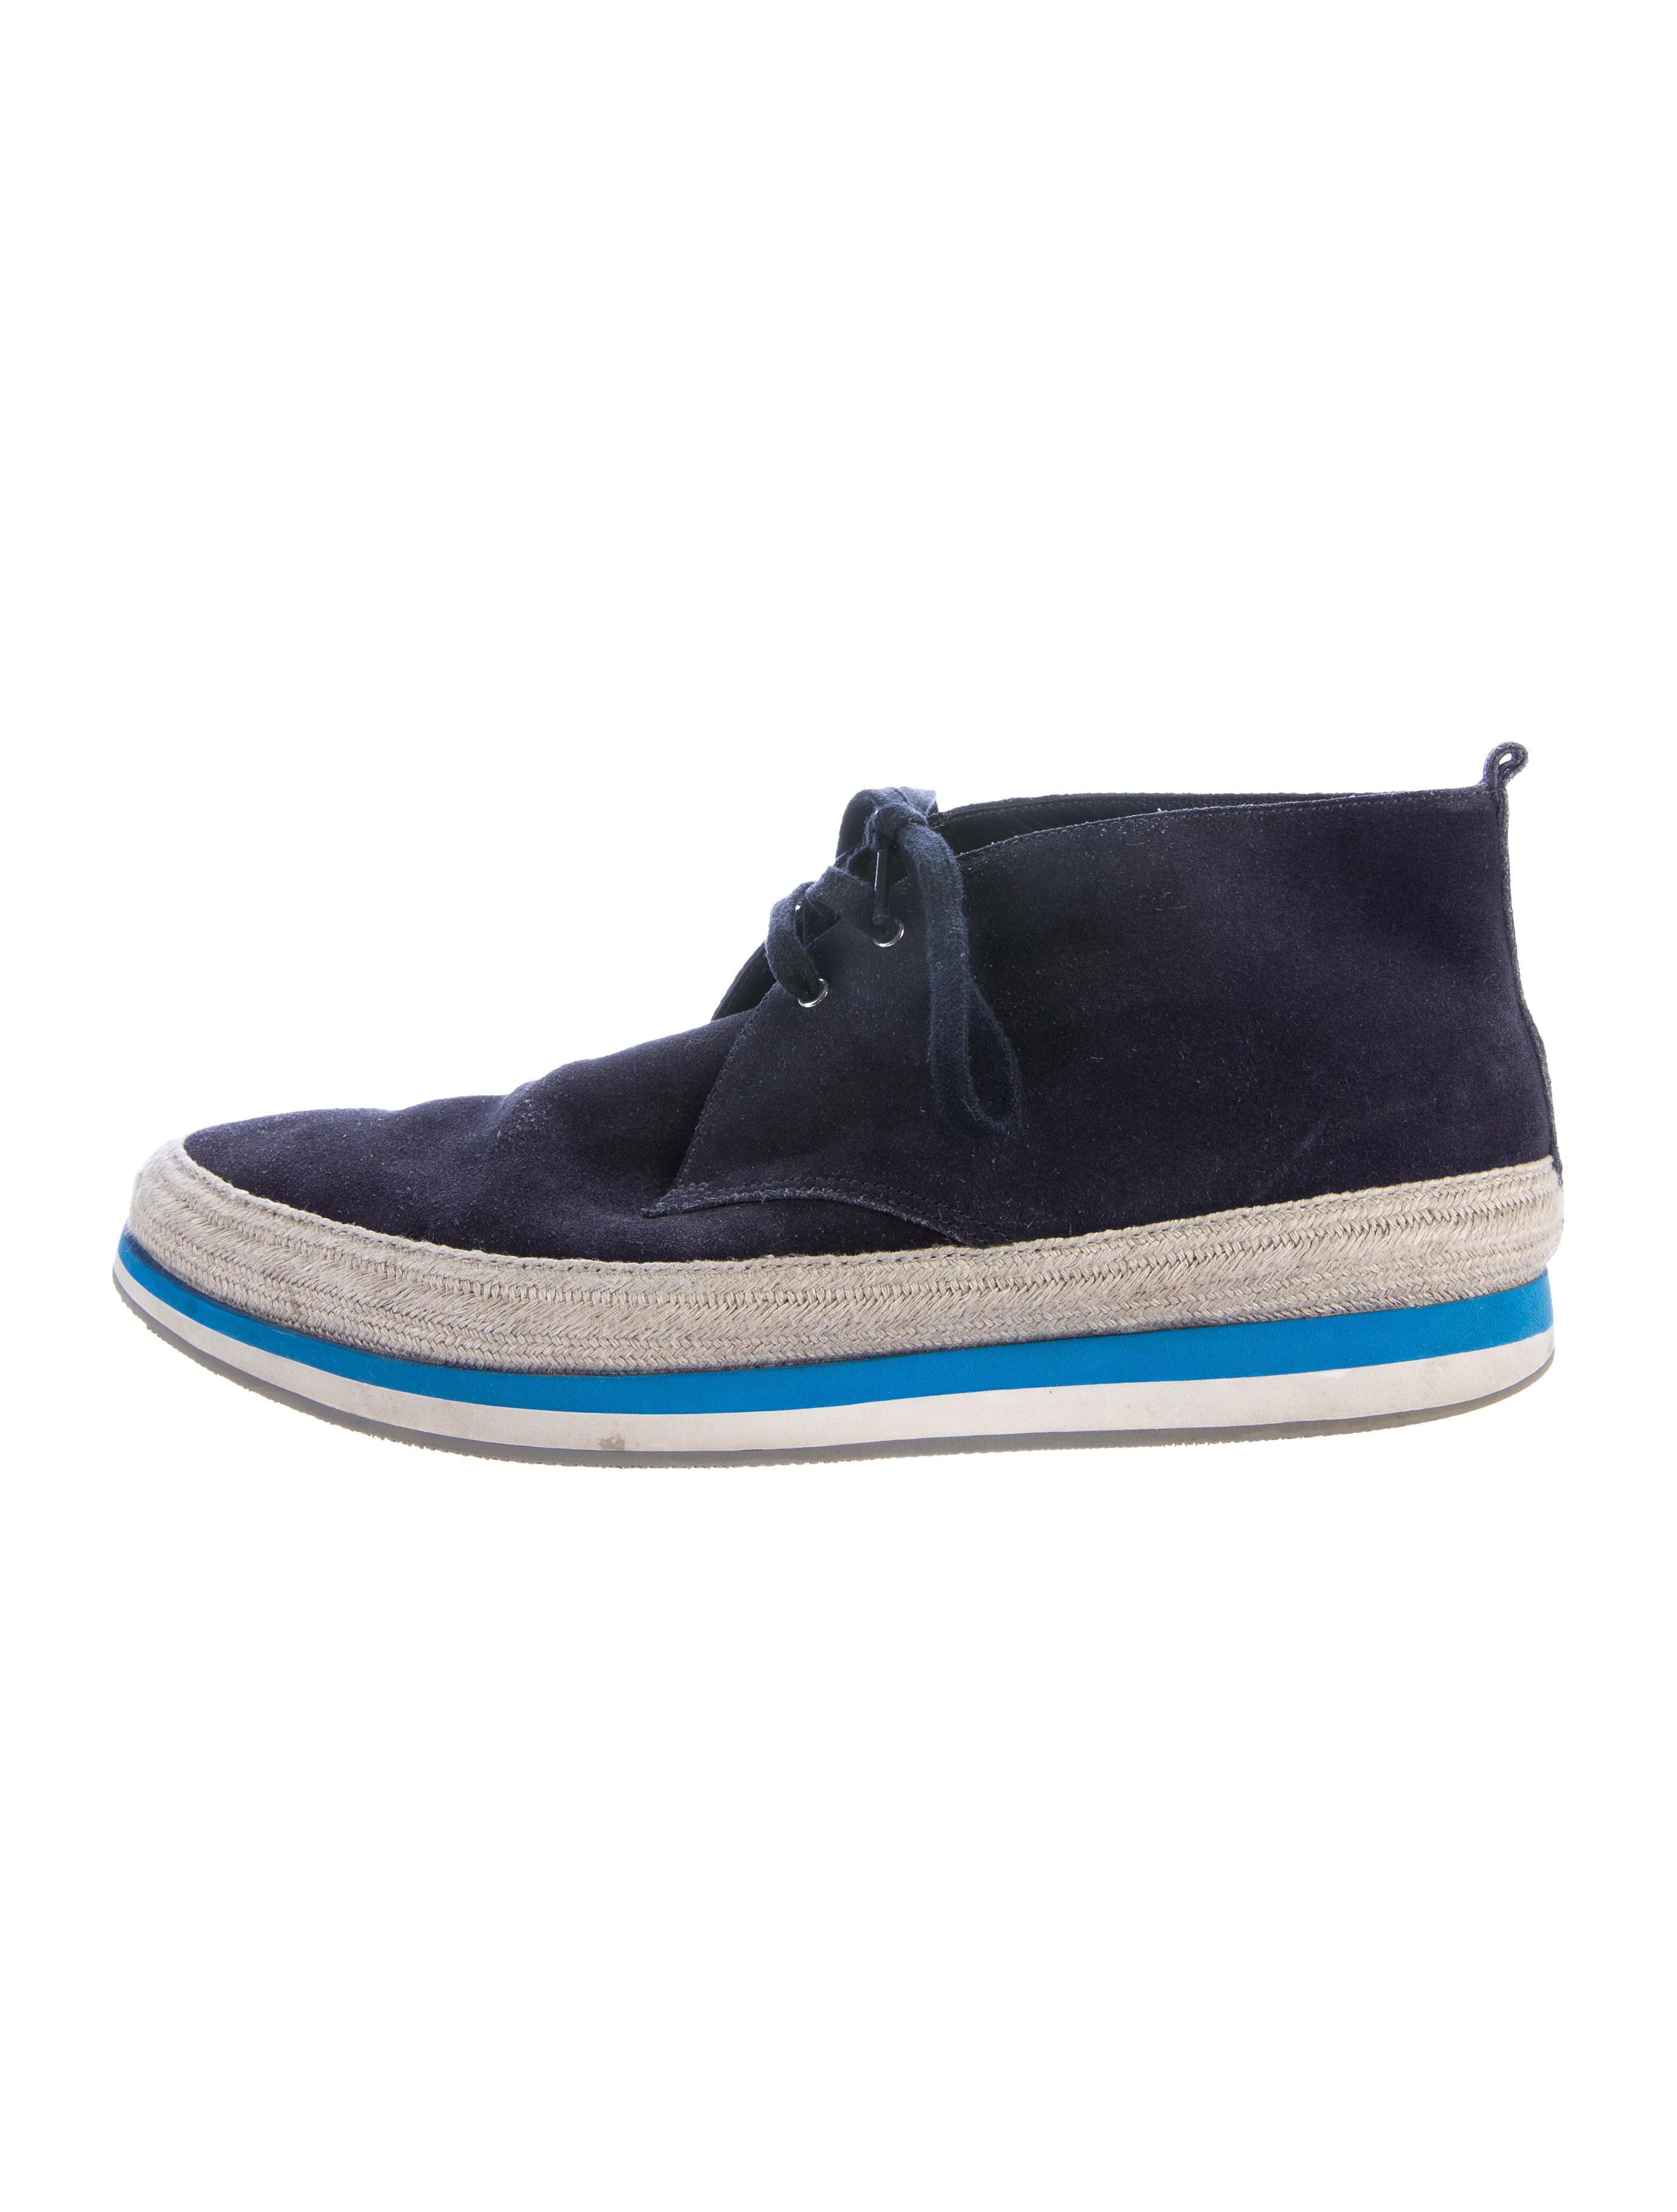 prada sport suede chukka boots shoes wpr40494 the